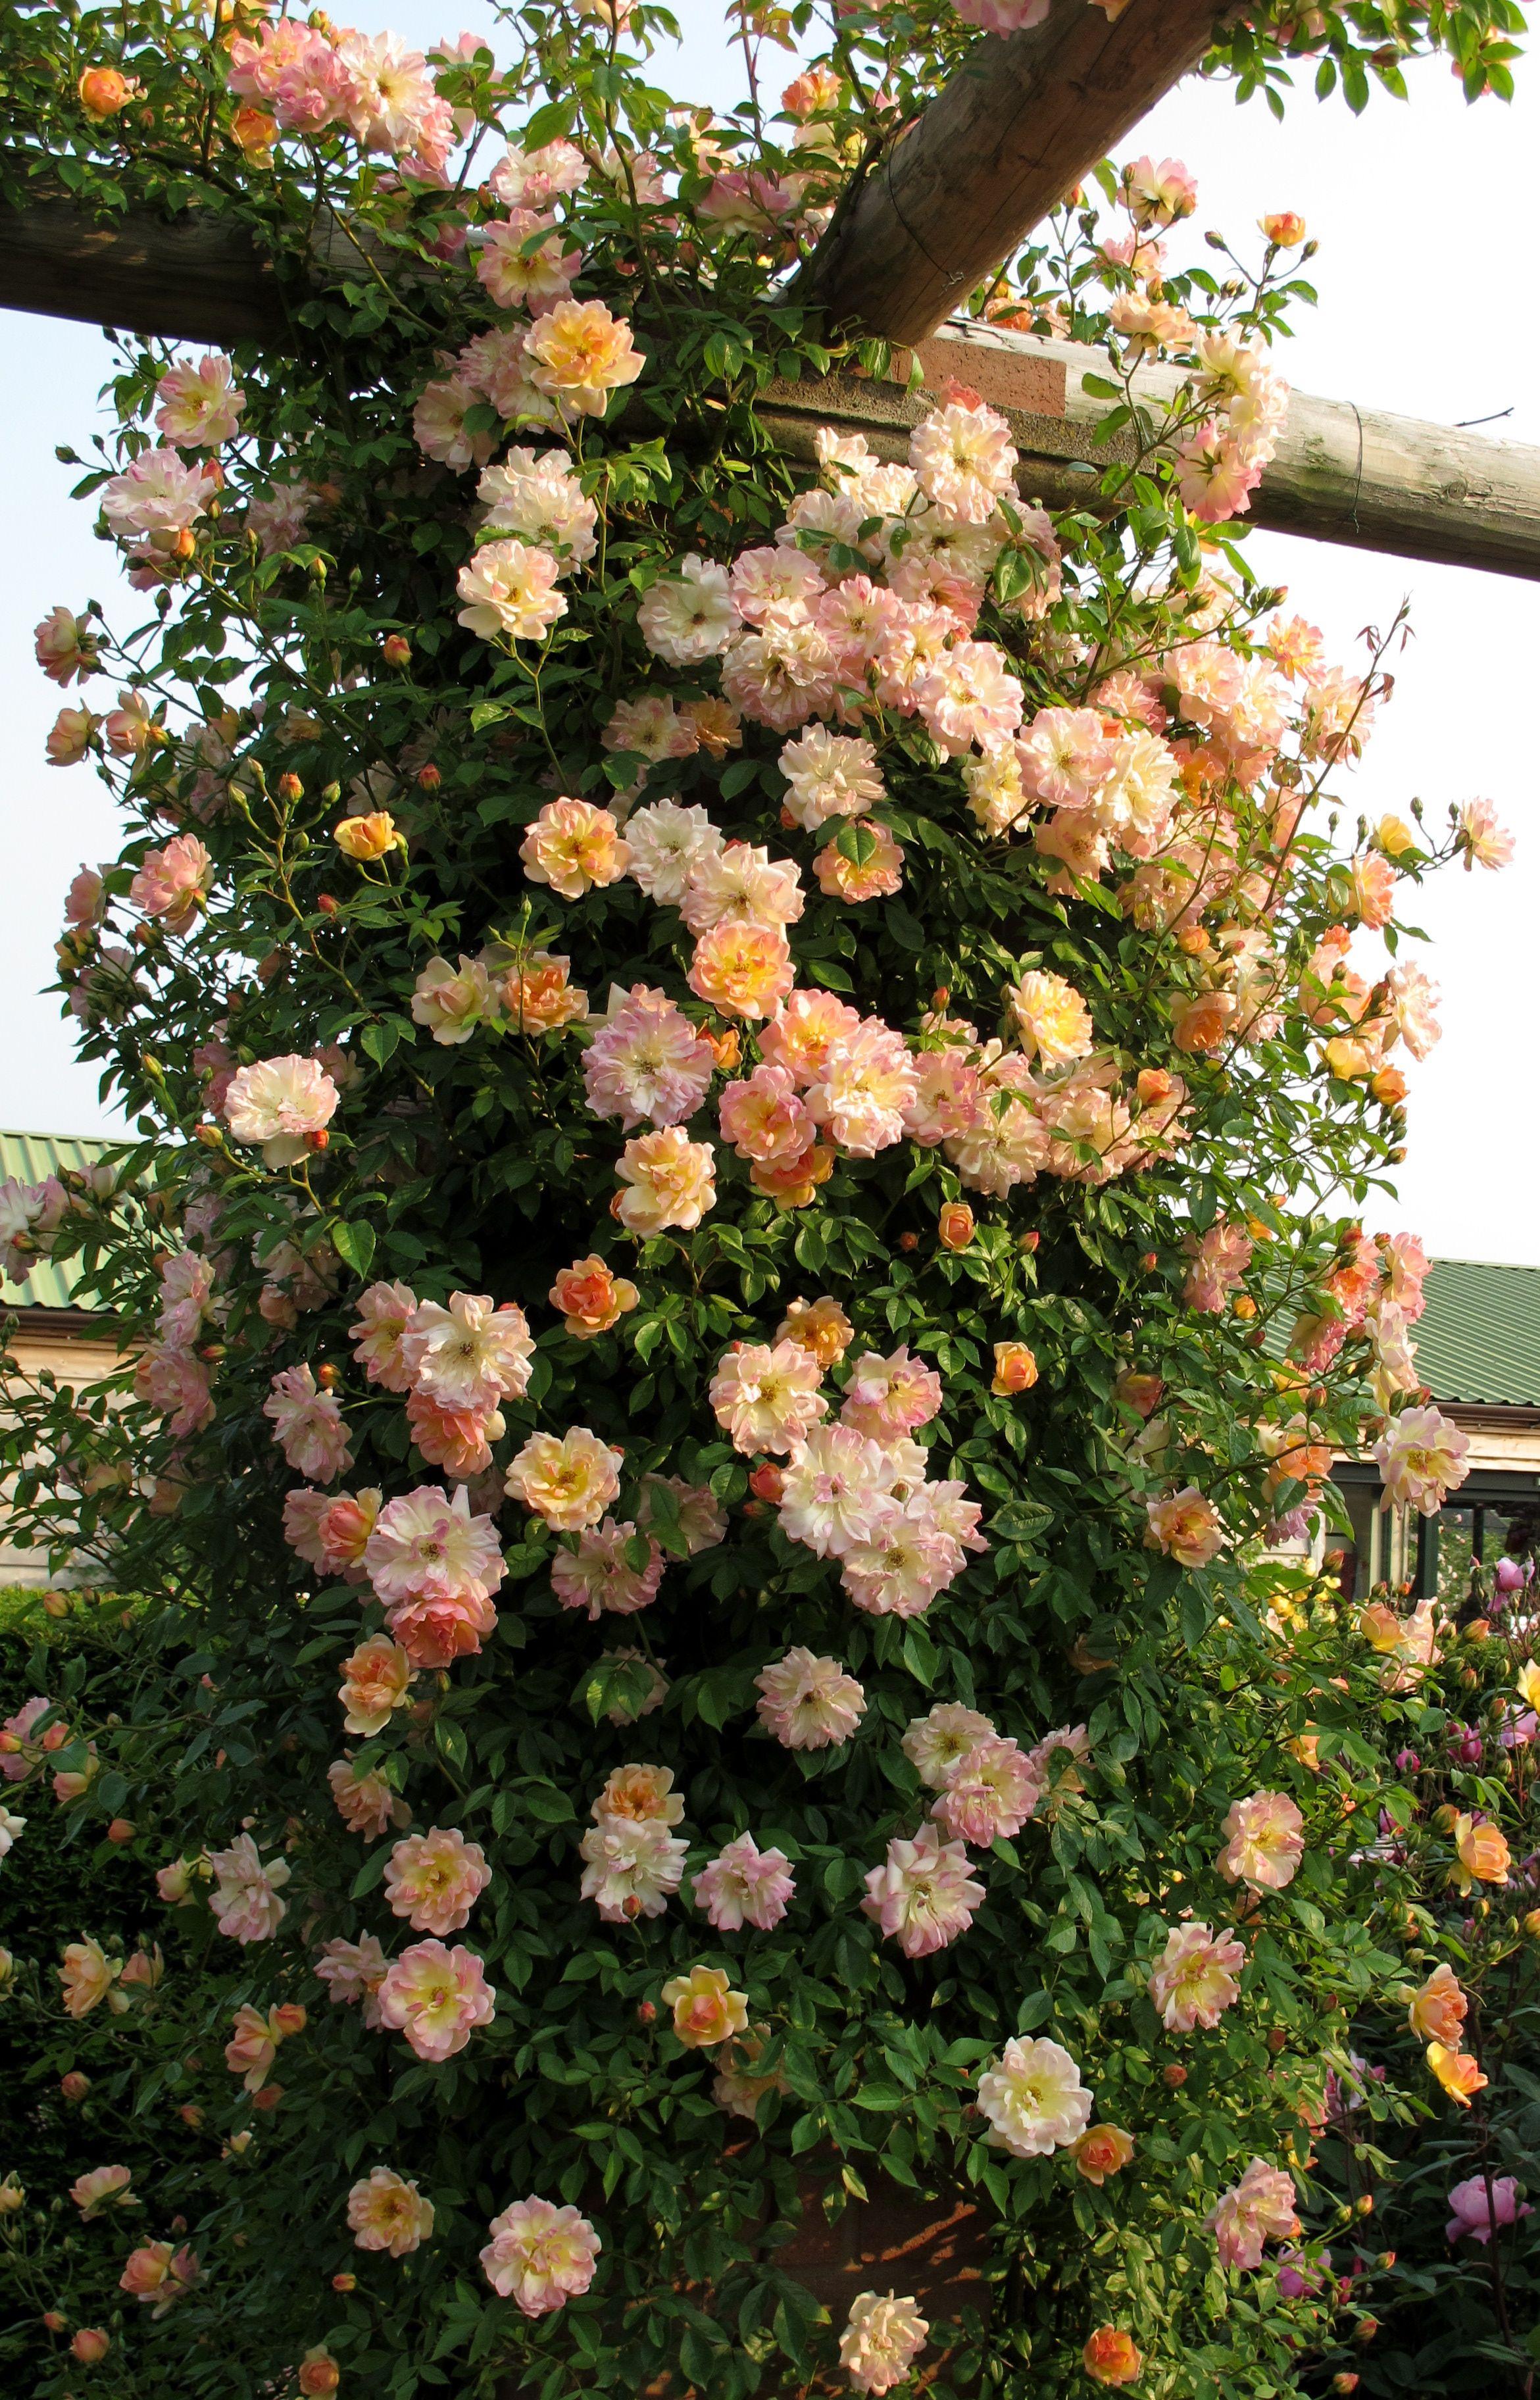 39 phyllis bide 39 rambler is a wonderful pillar rose lovely. Black Bedroom Furniture Sets. Home Design Ideas